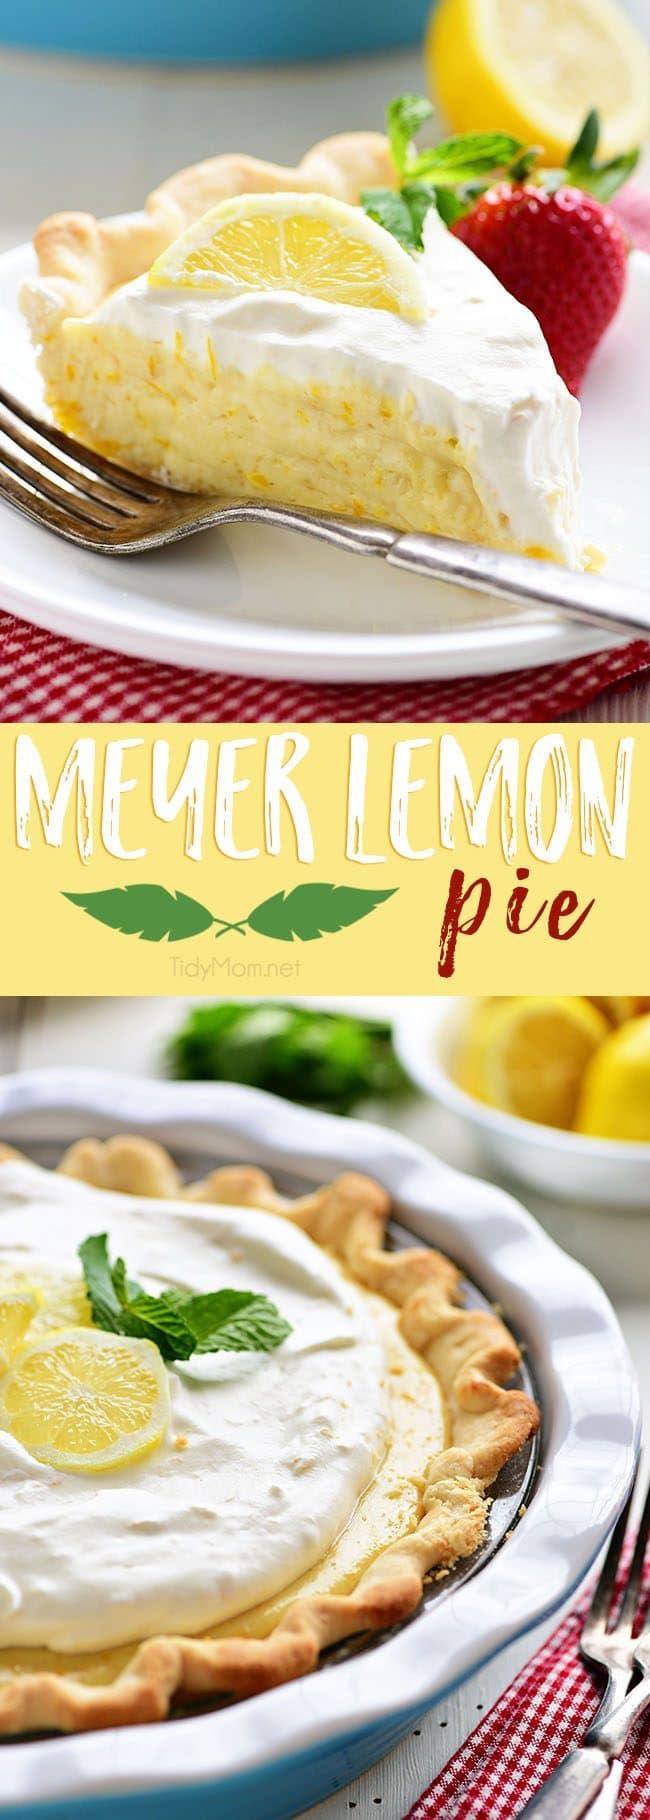 Meyer Lemon Pie photo collage